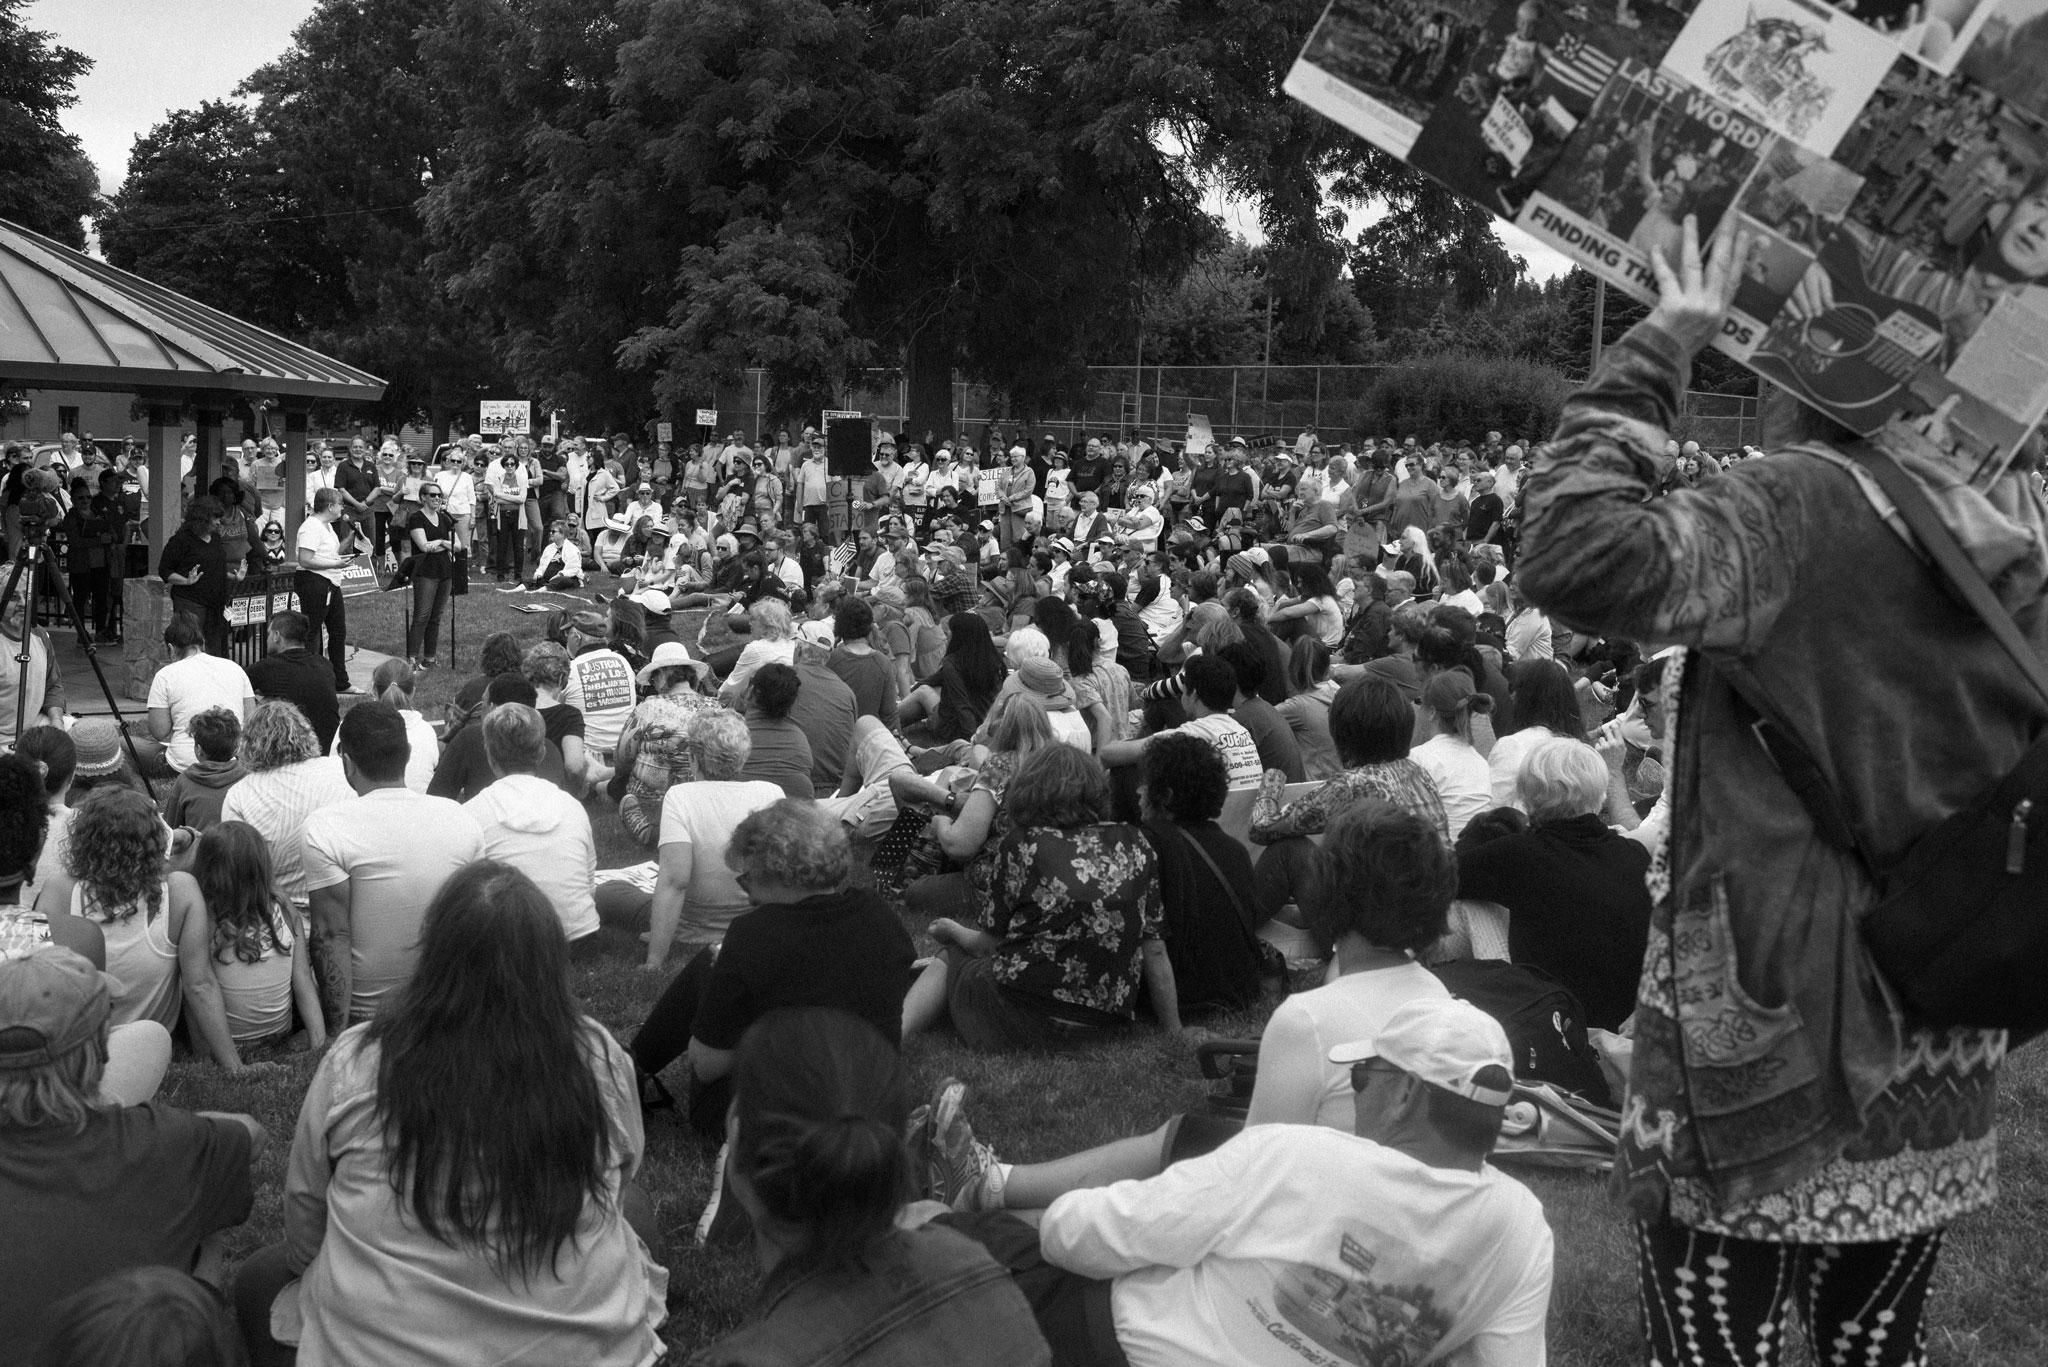 crowd watching speaker